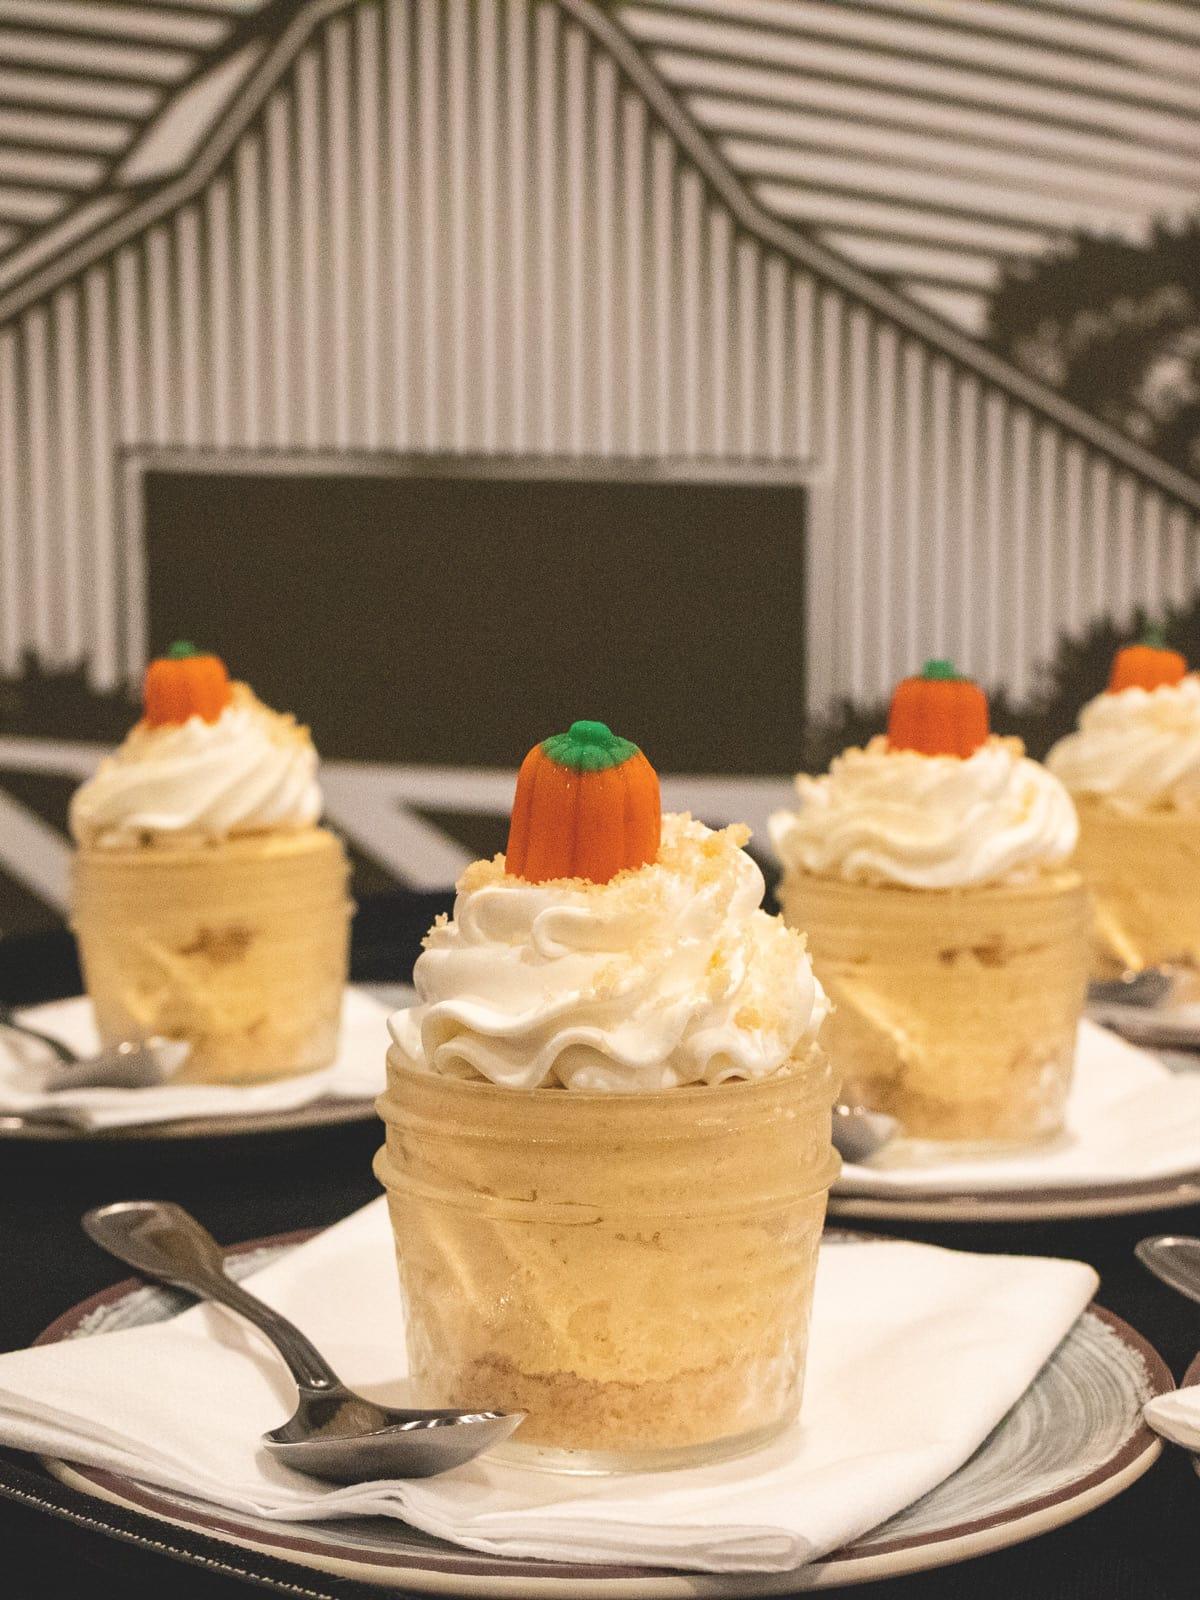 Pumpkin Fluff Dessert at Dollywood's Front Porch Cafe